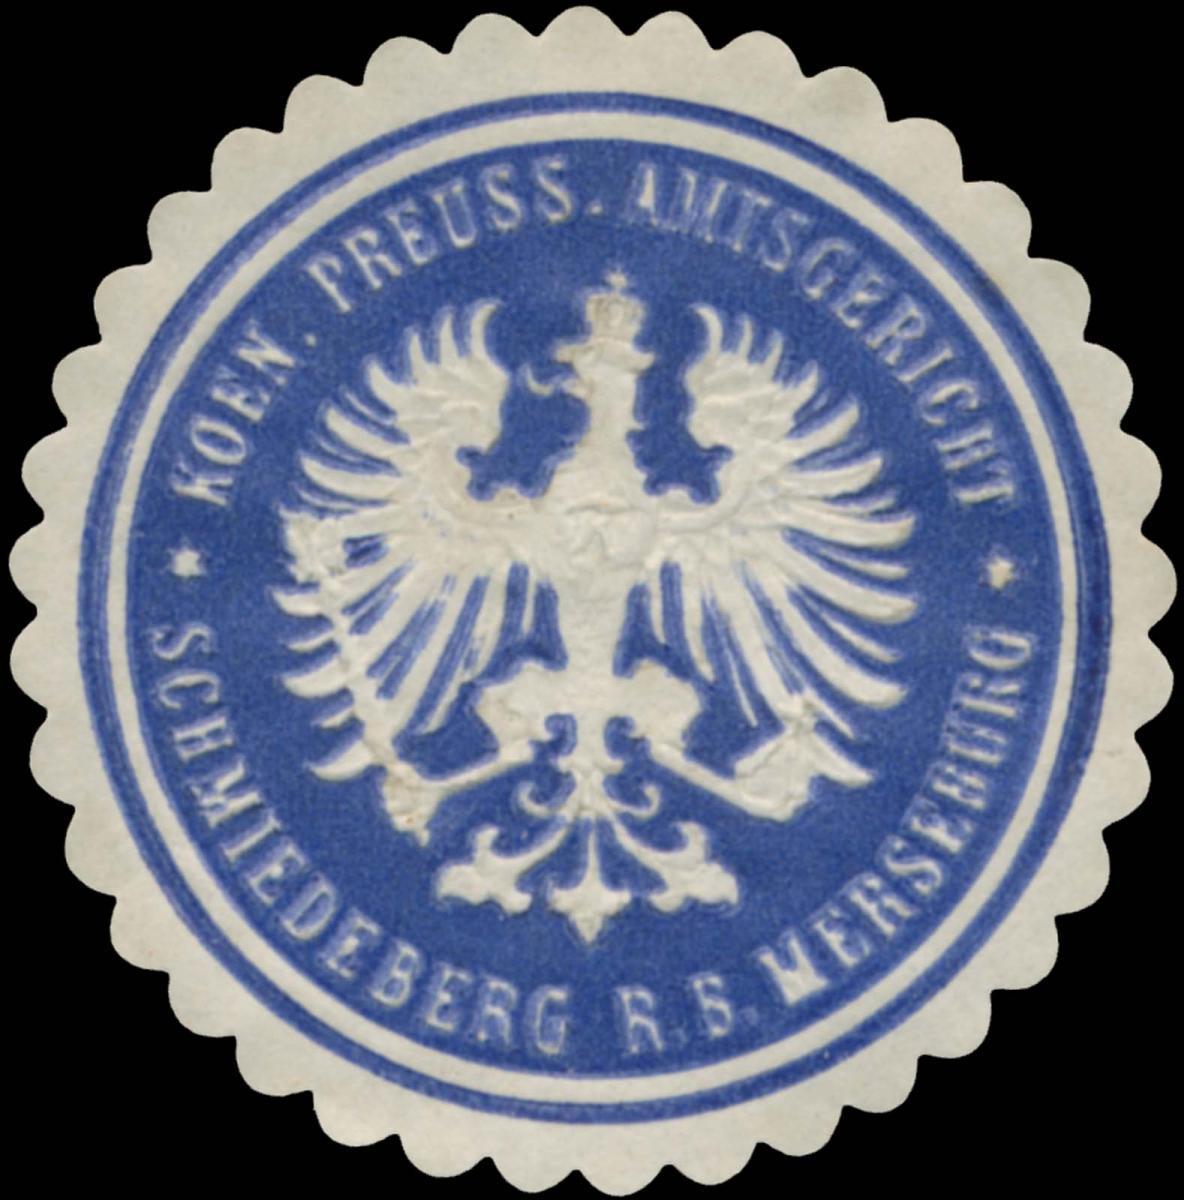 K.Pr. Amtsgericht Schmiedeberg R.B. Merseburg